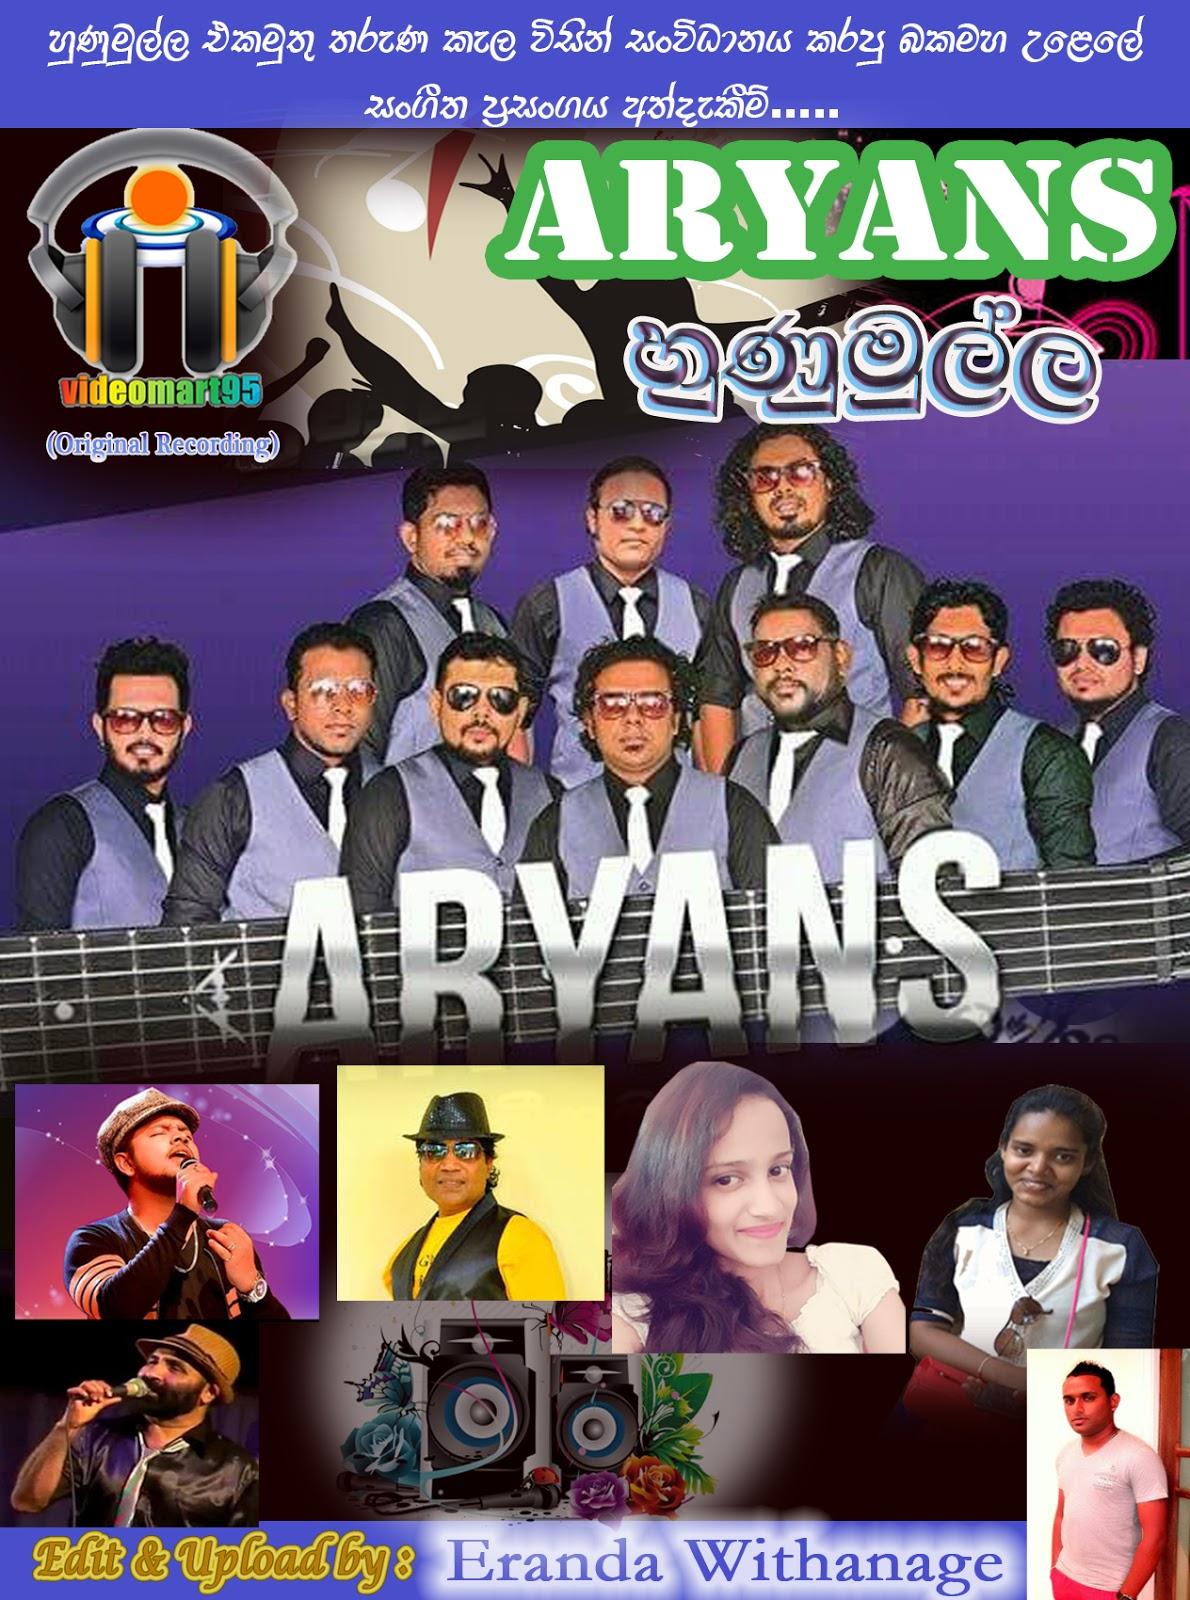 Negombo Aryans Live Hunumulla 17 04 2017 Videomart95